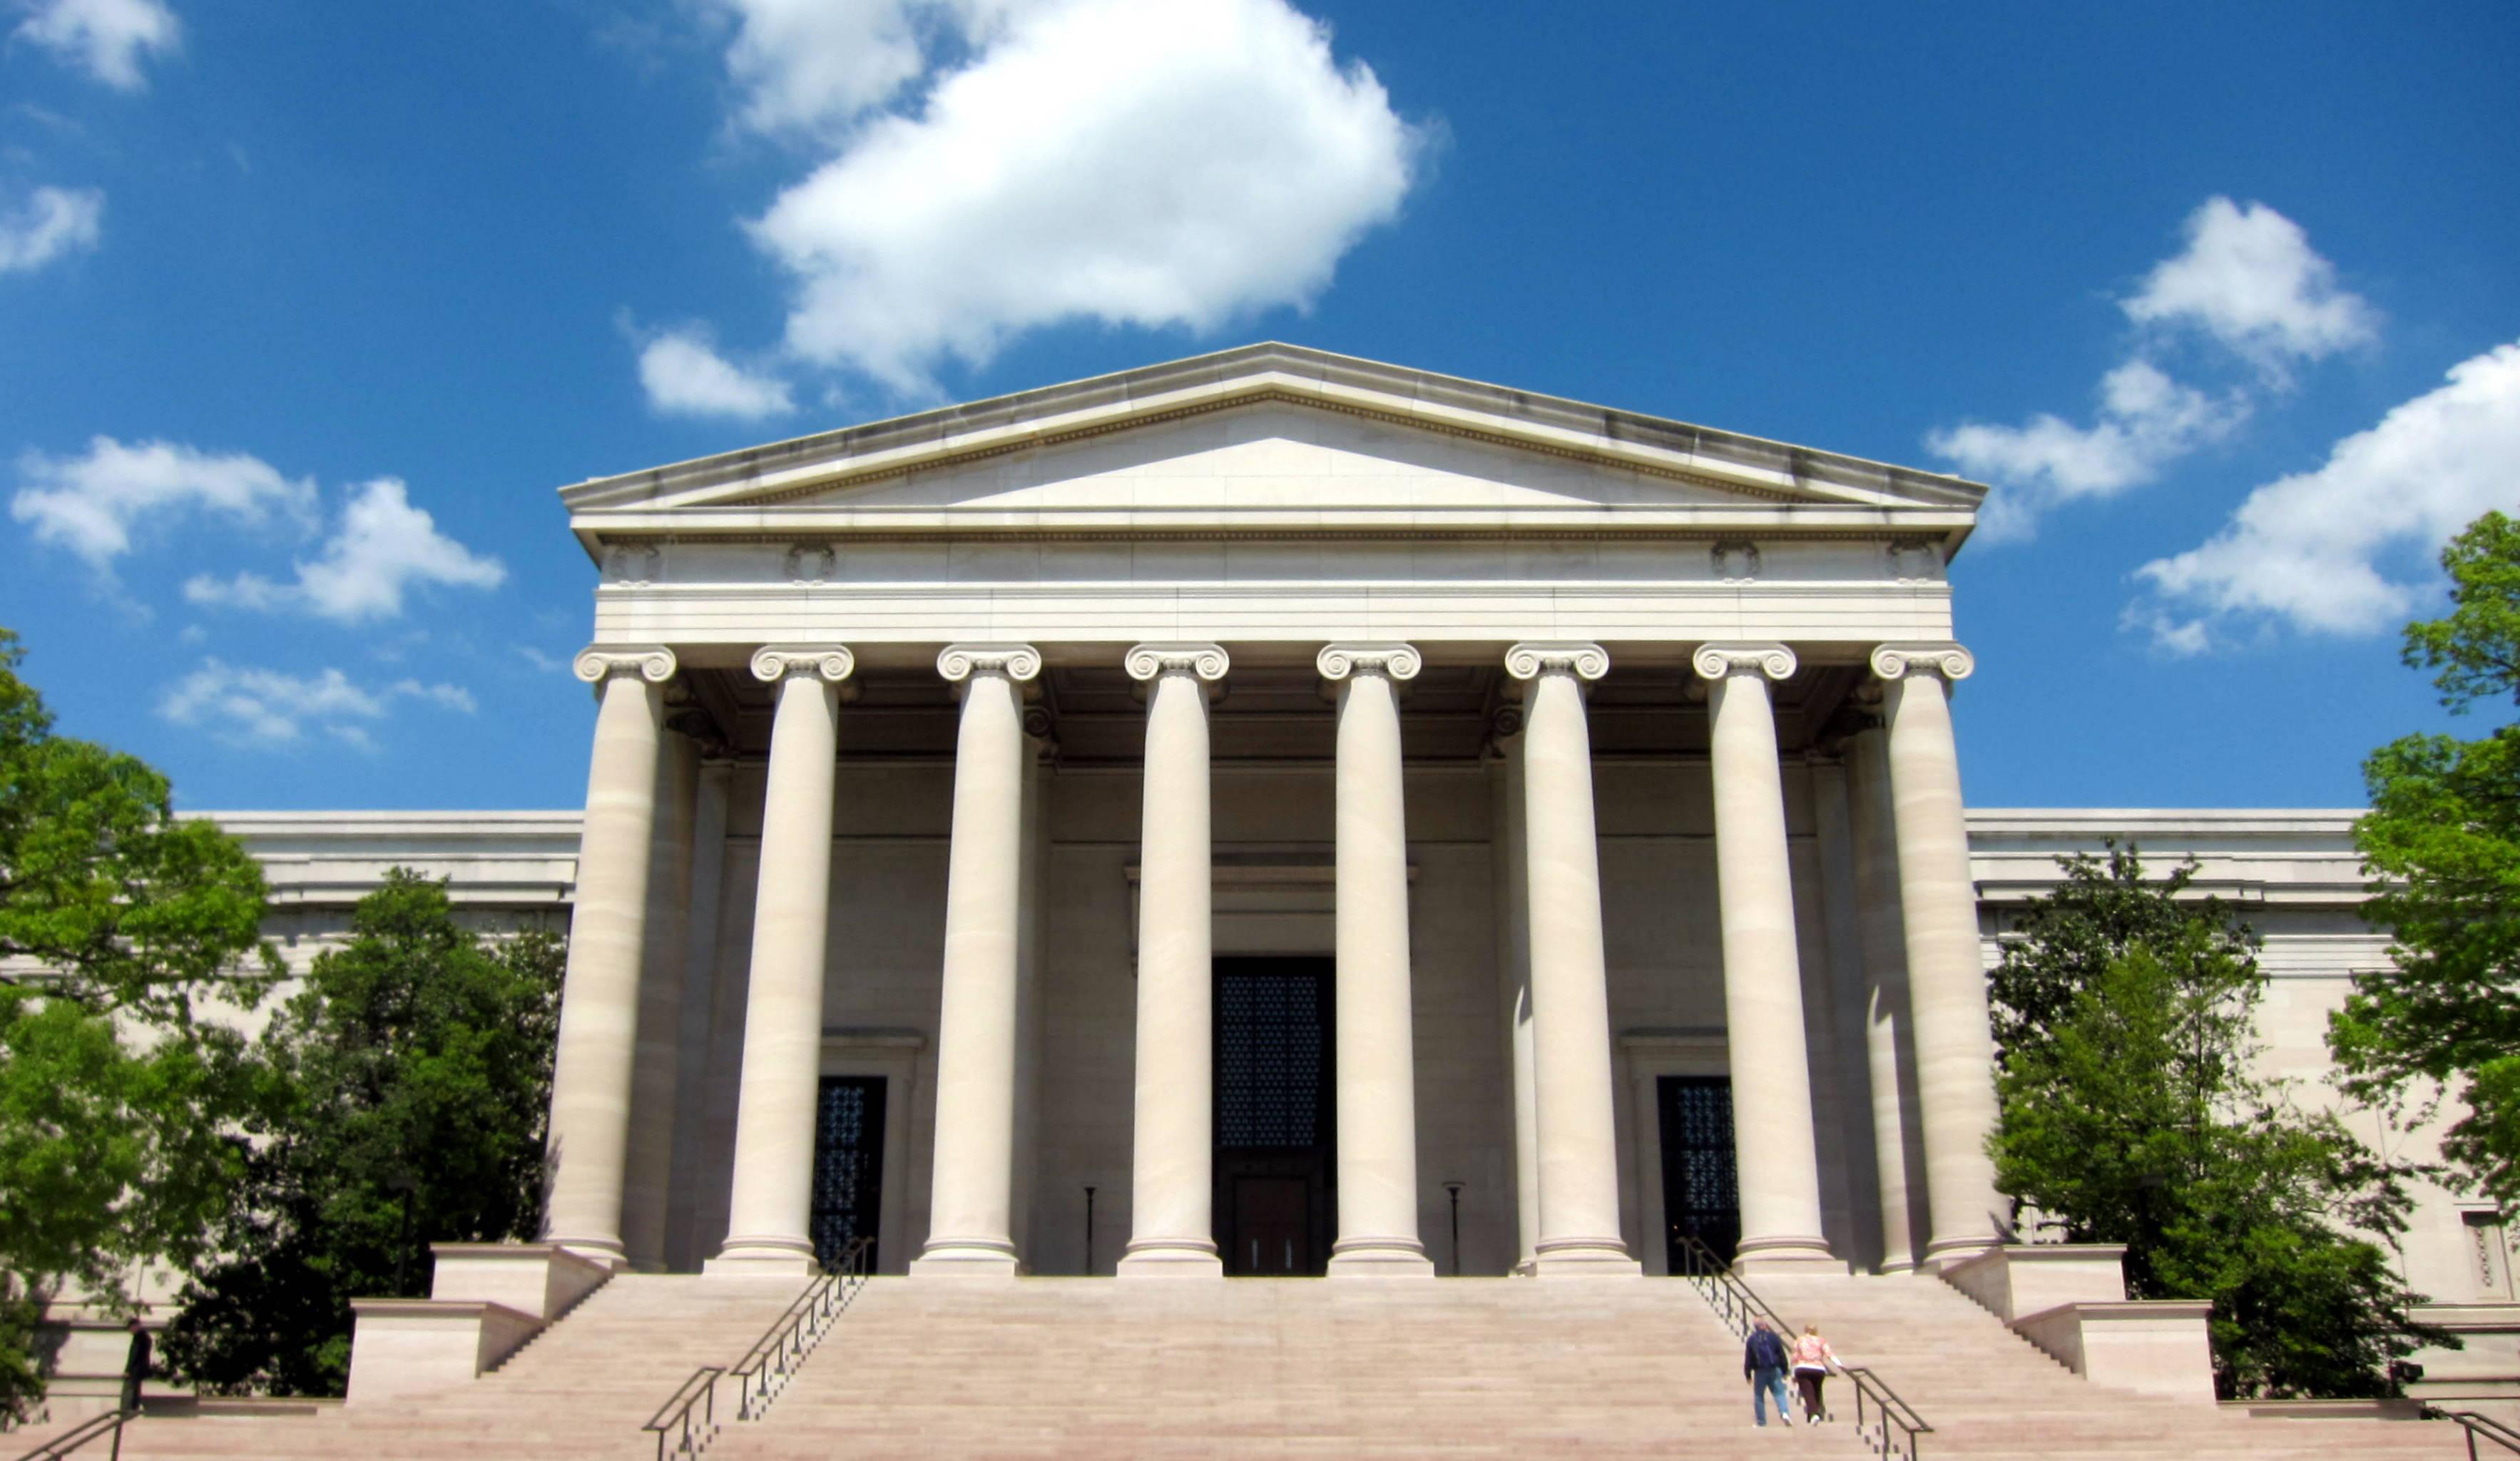 National Gallery of Art - West Building facade.JPG